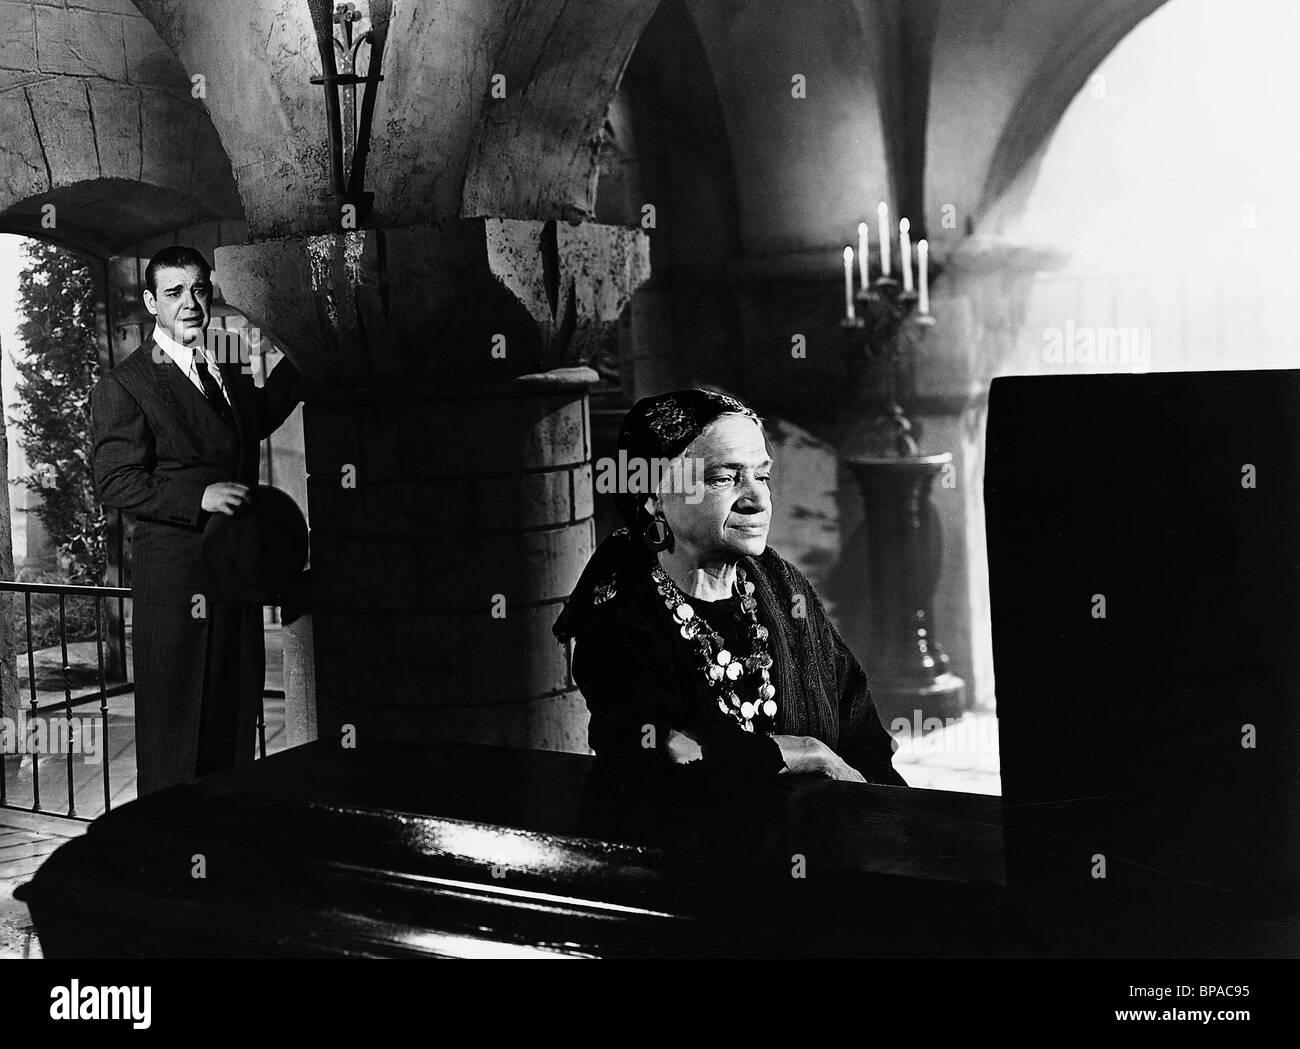 Watch Melai Cantiveros (b. 1988) video